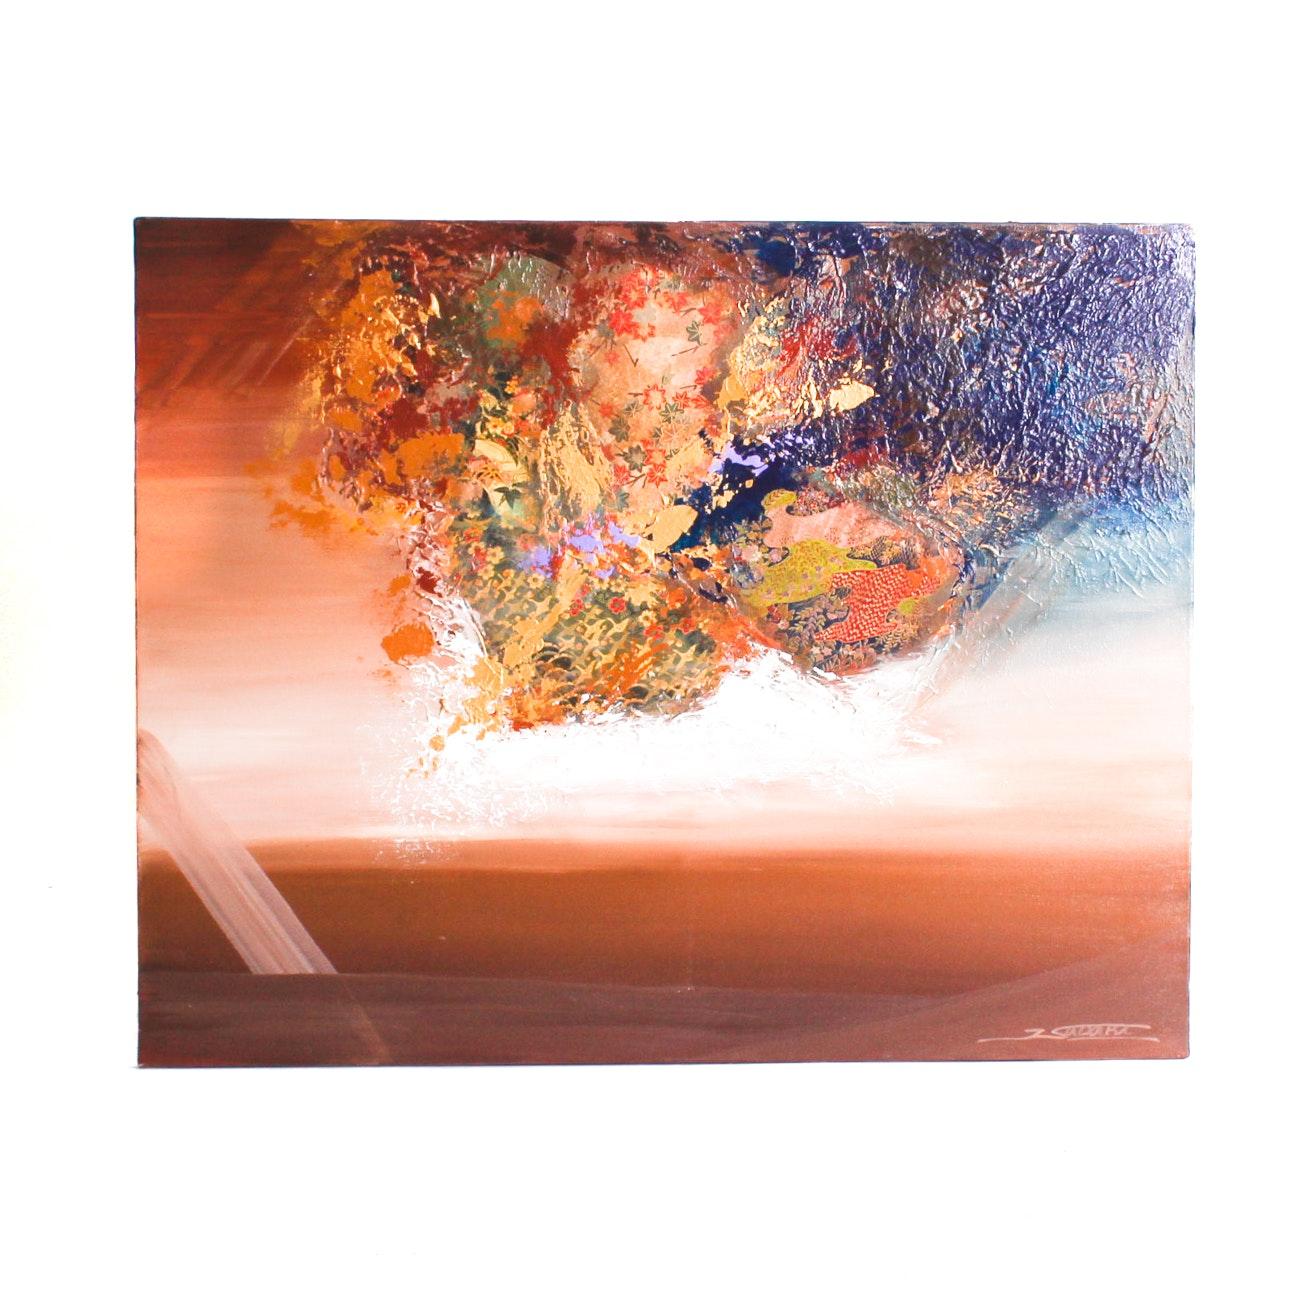 Original Mixed Media on Canvas Abstract Collage by J. Sadaki